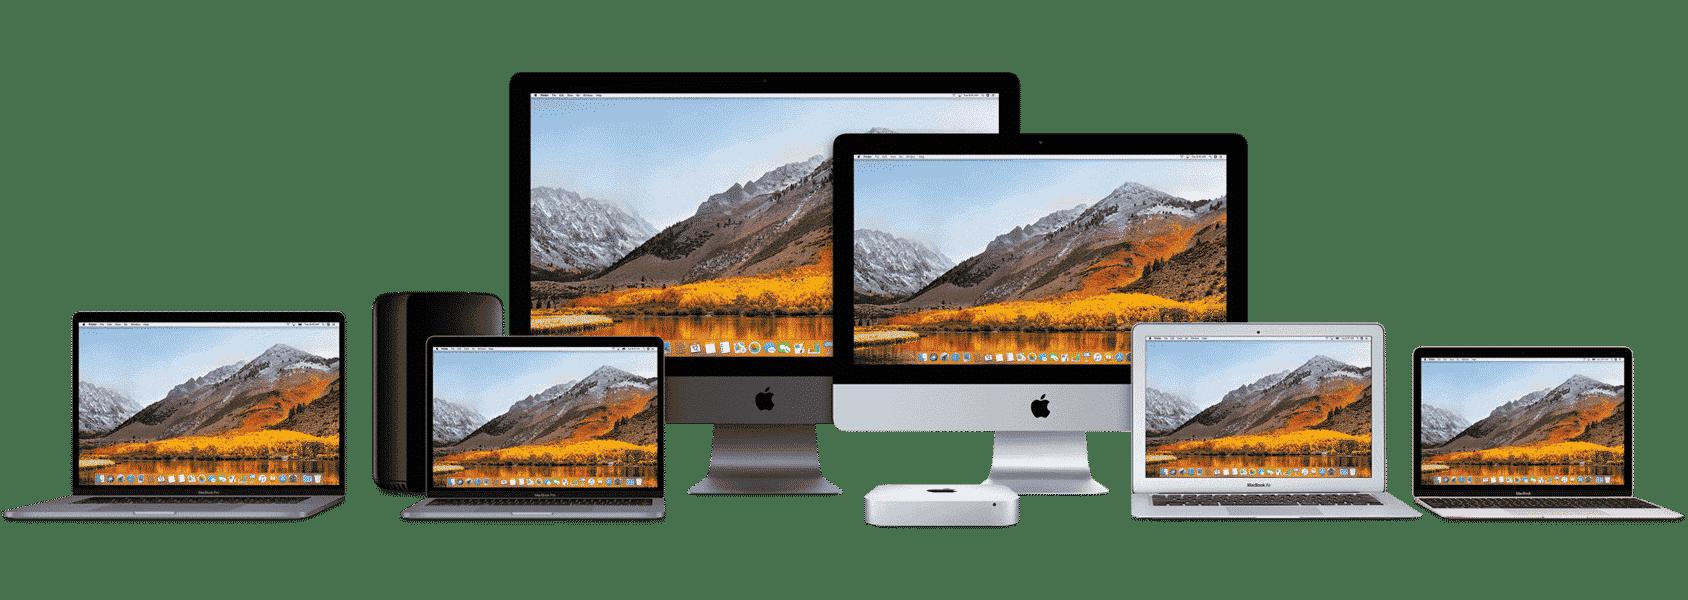 Gamme Apple - Entreprise Responsable